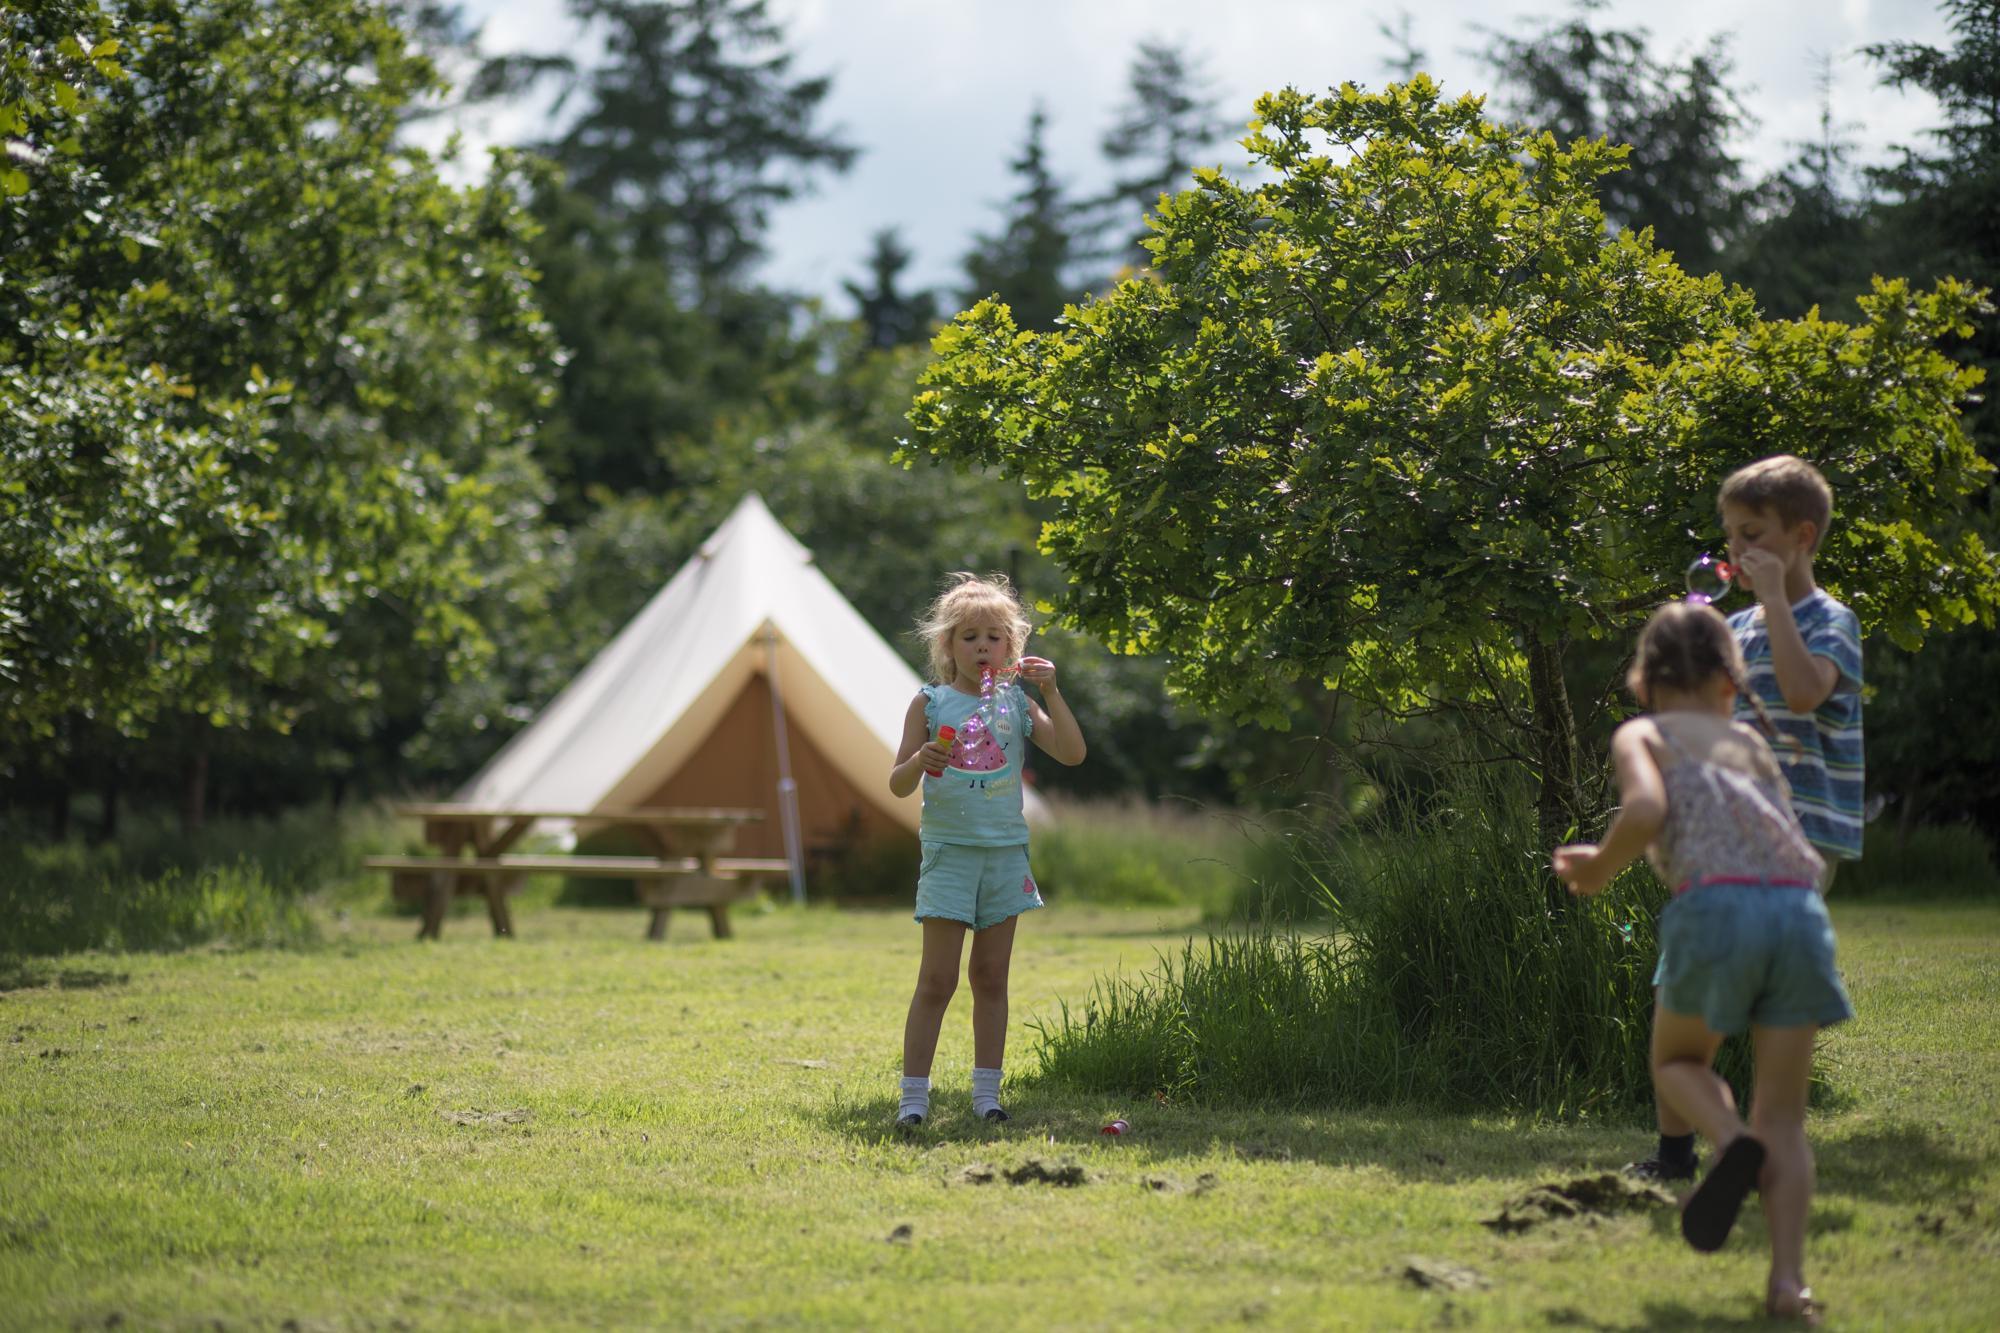 Glamping in Ludlow – Cool Camping